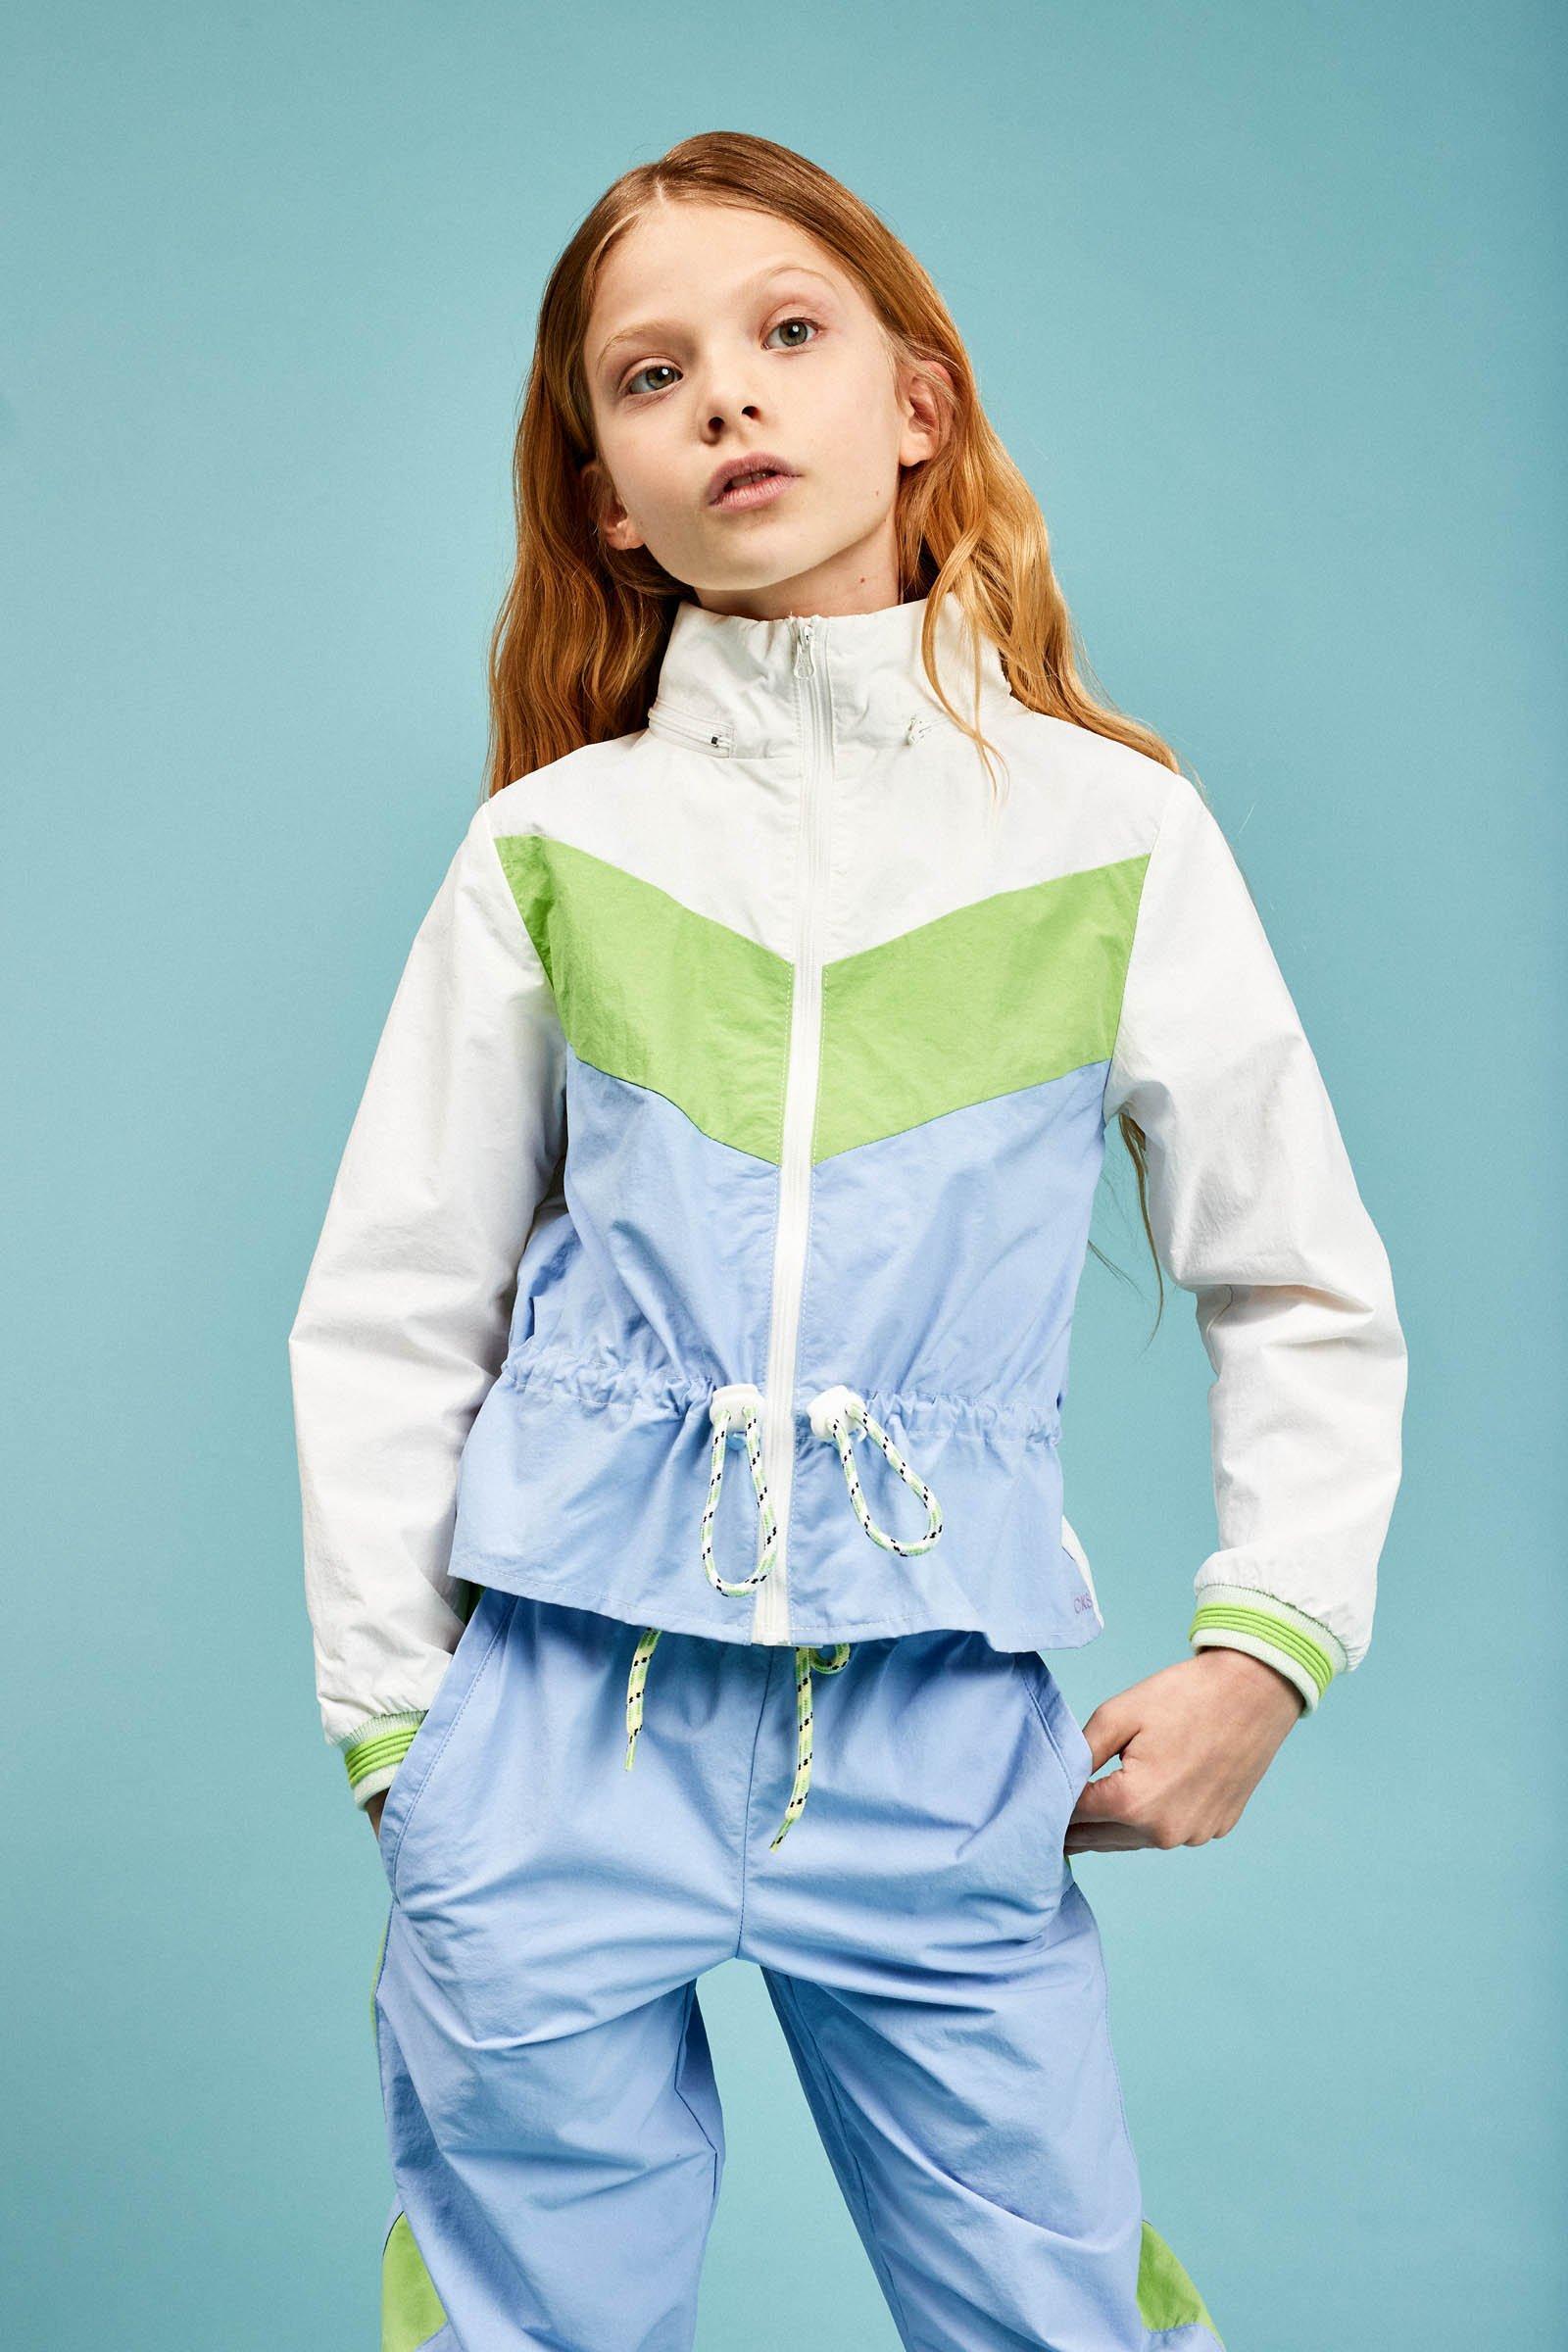 CKS Kids - DEAN - korte casual jas - wit